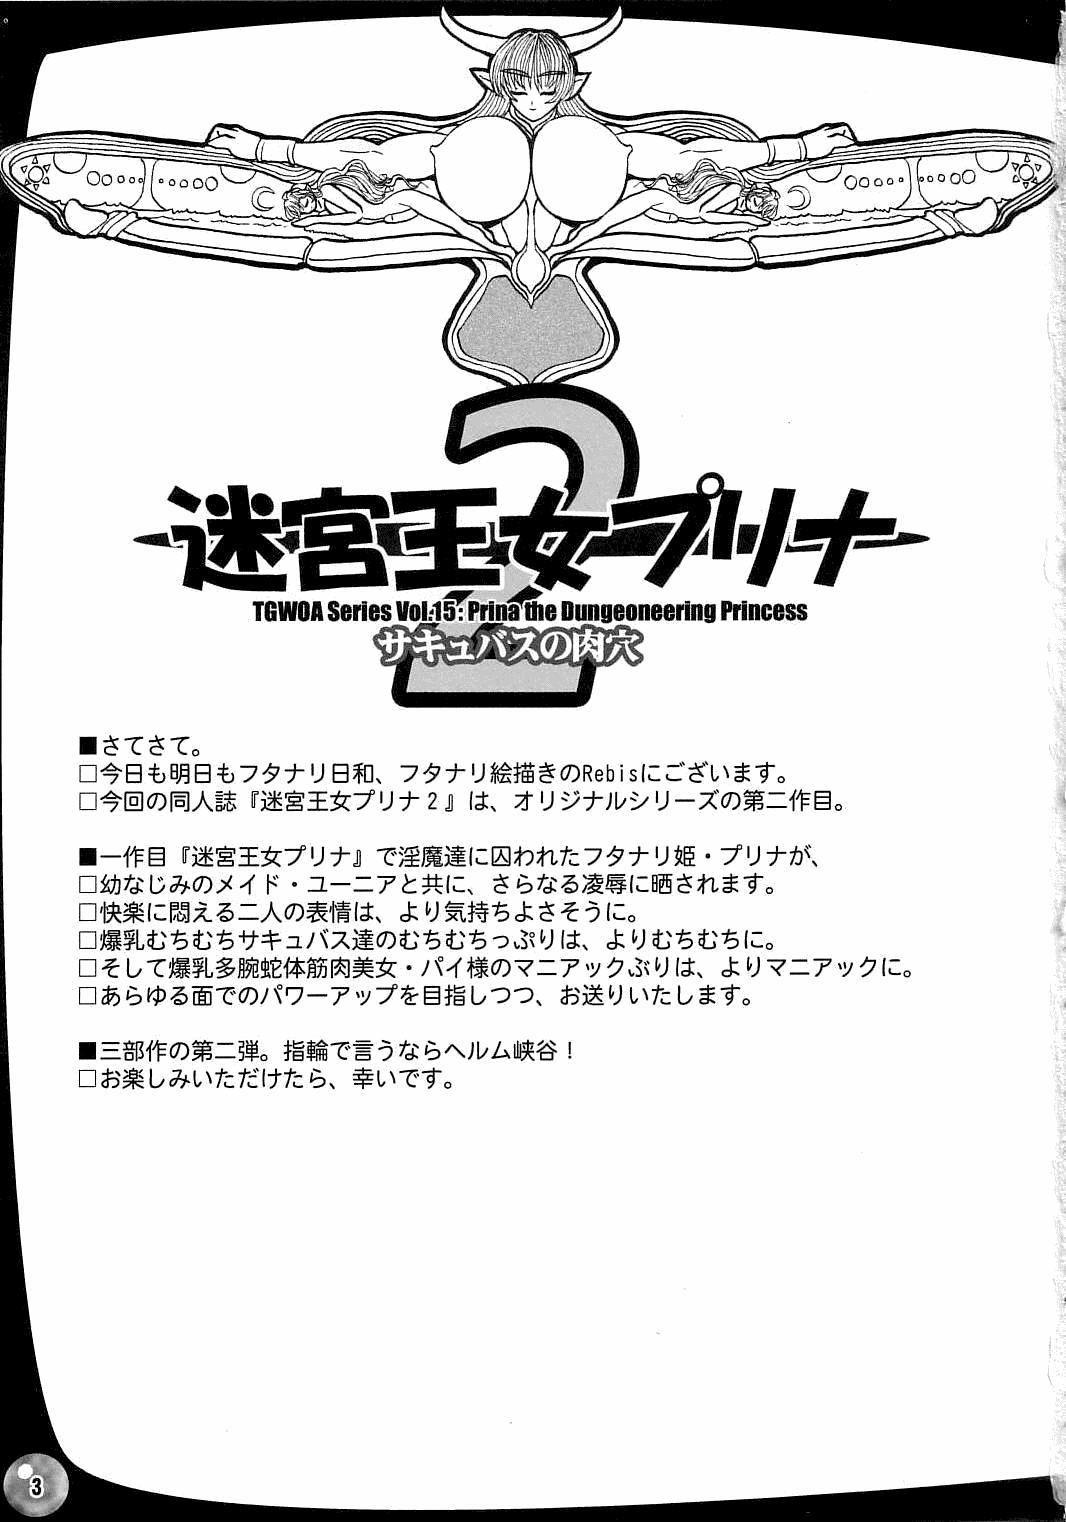 The Great Work of Alchemy Vol.15 - Meikyuu Oujo Prina 2 | Prina the Dungeoneering Princess 2 2